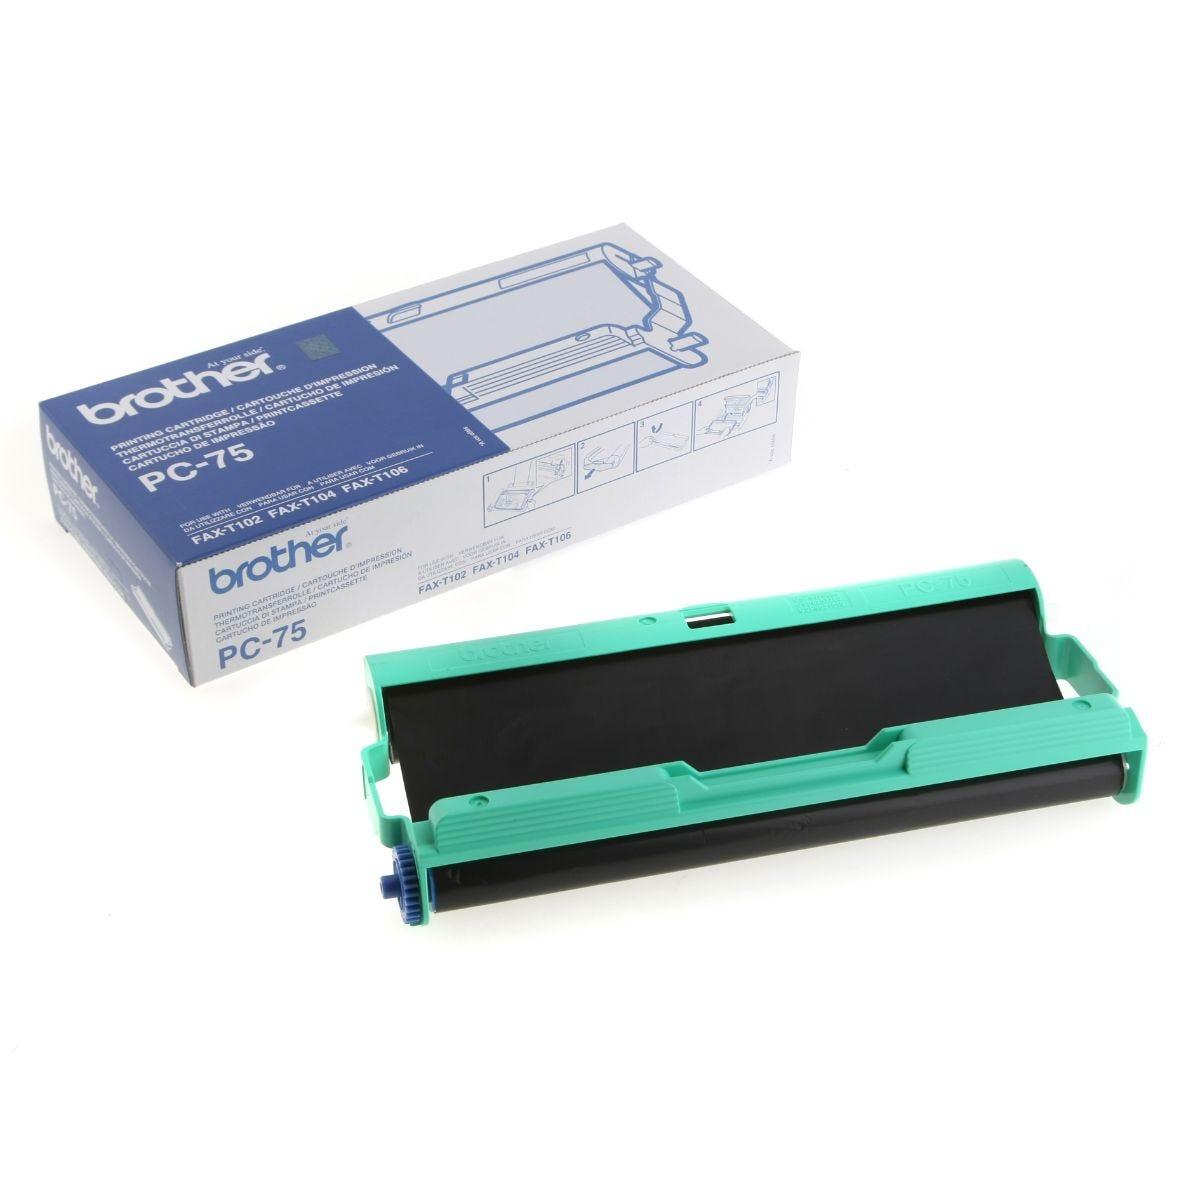 Brother Fax Film PC-75 T104/106, Black